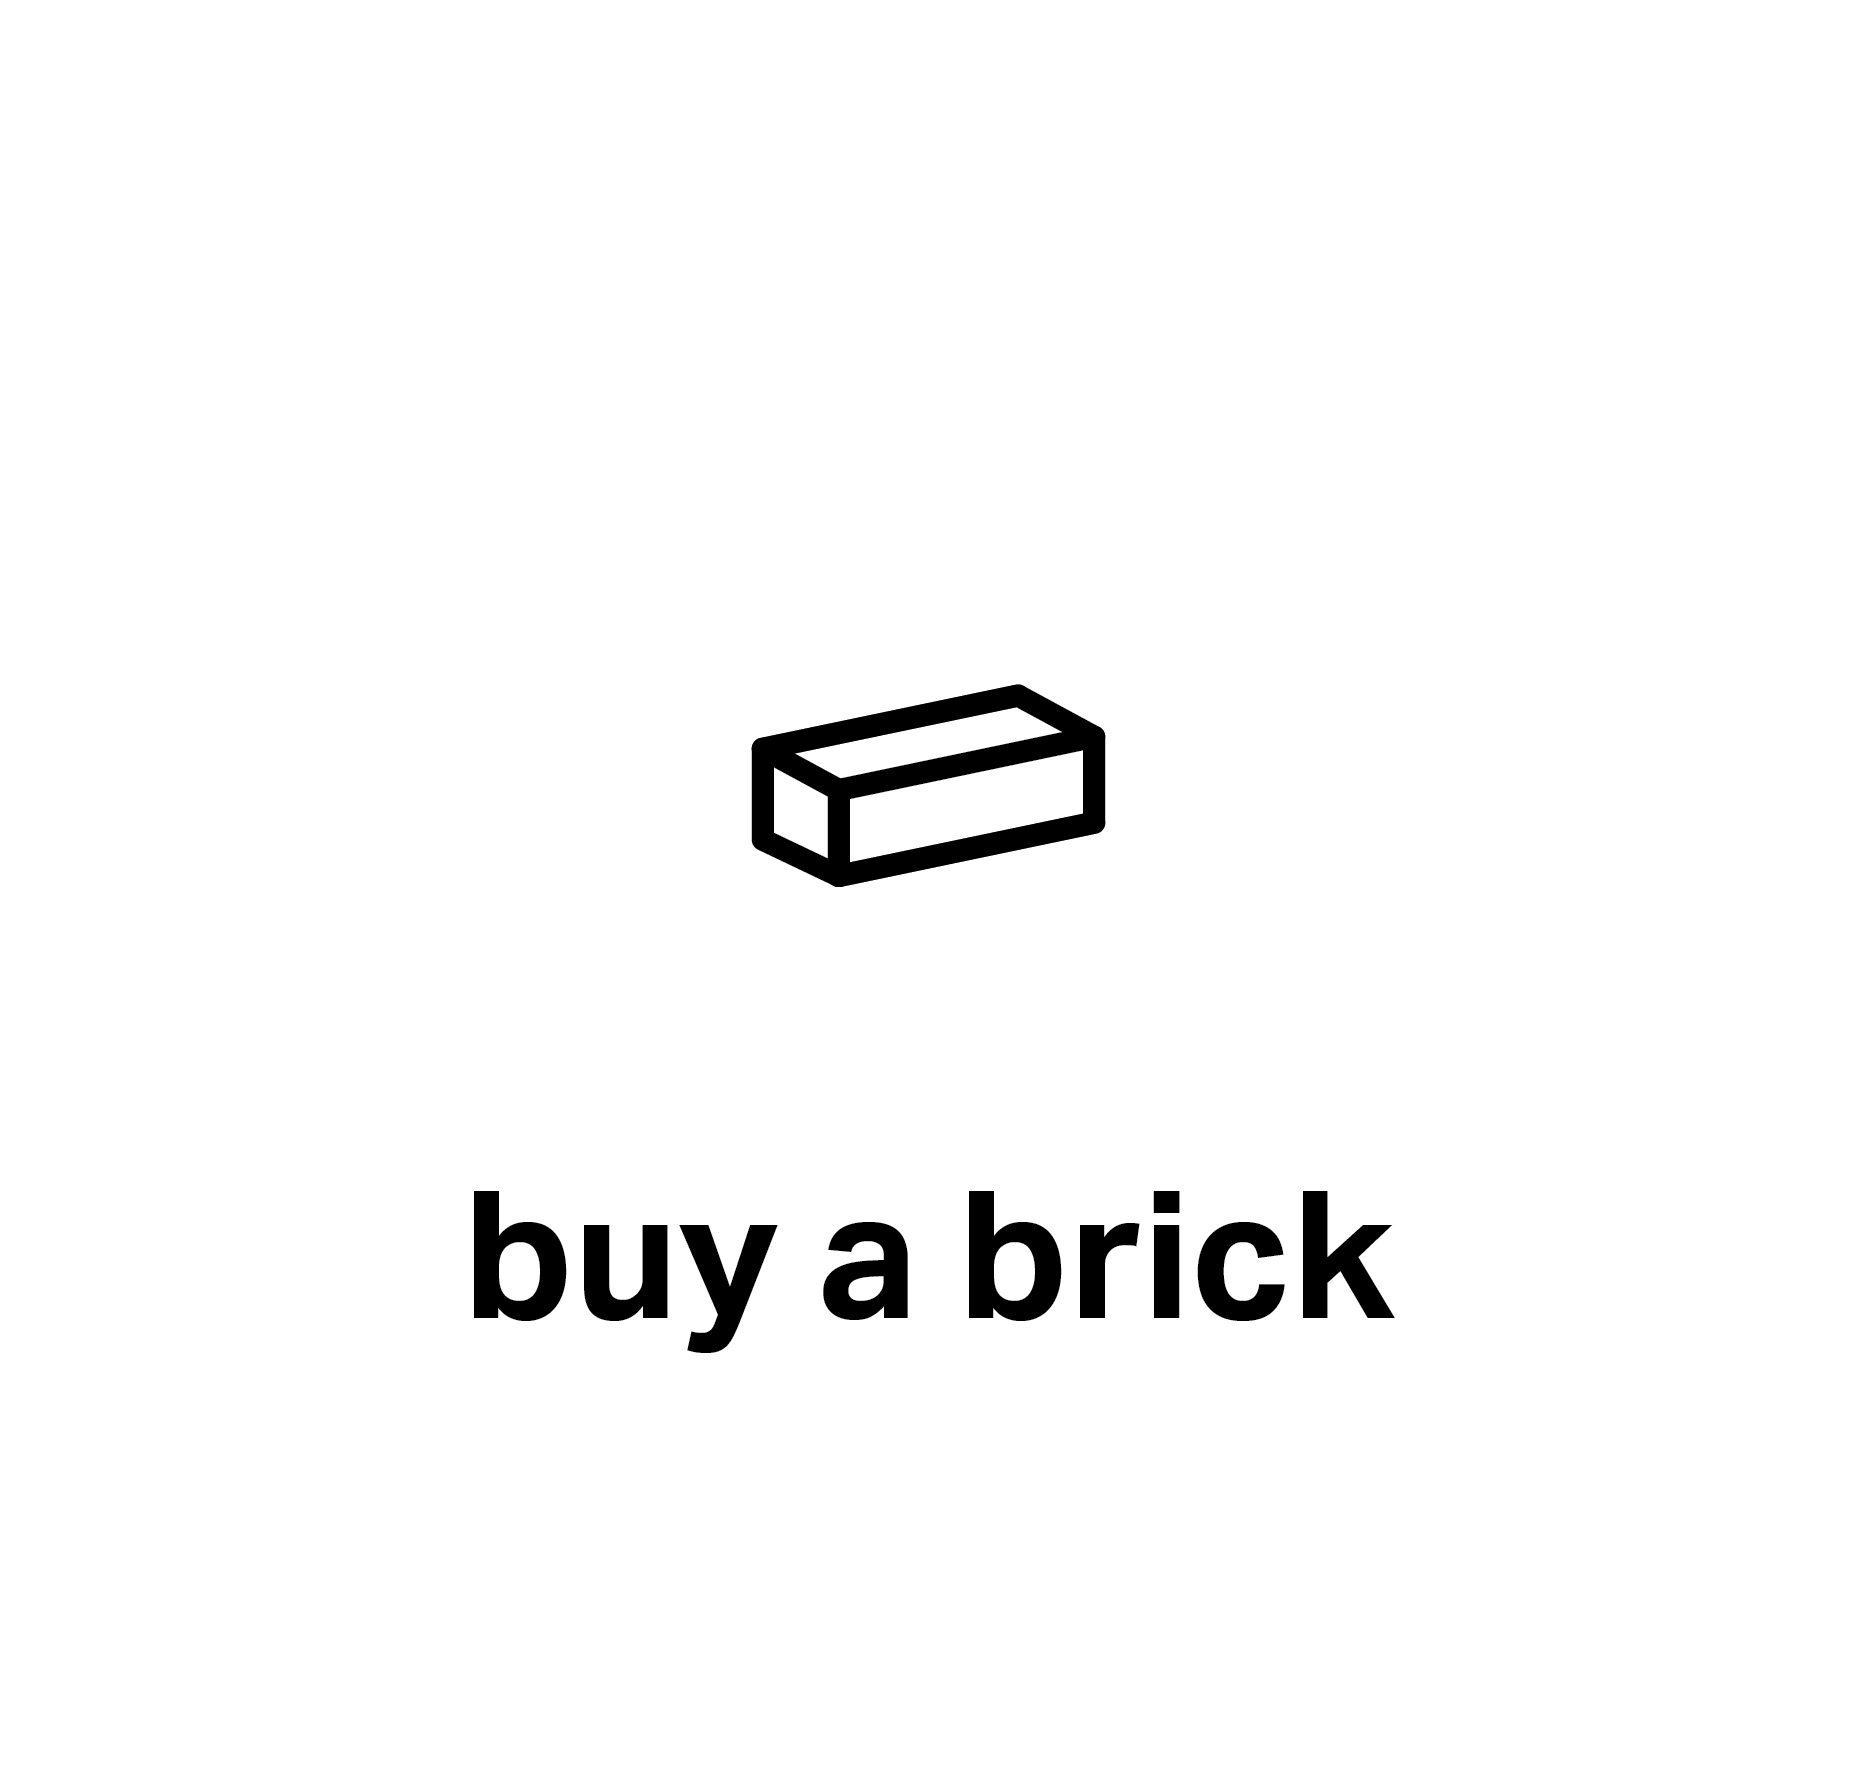 Asset 5CoreCityMobileShopIcon_Brick.png